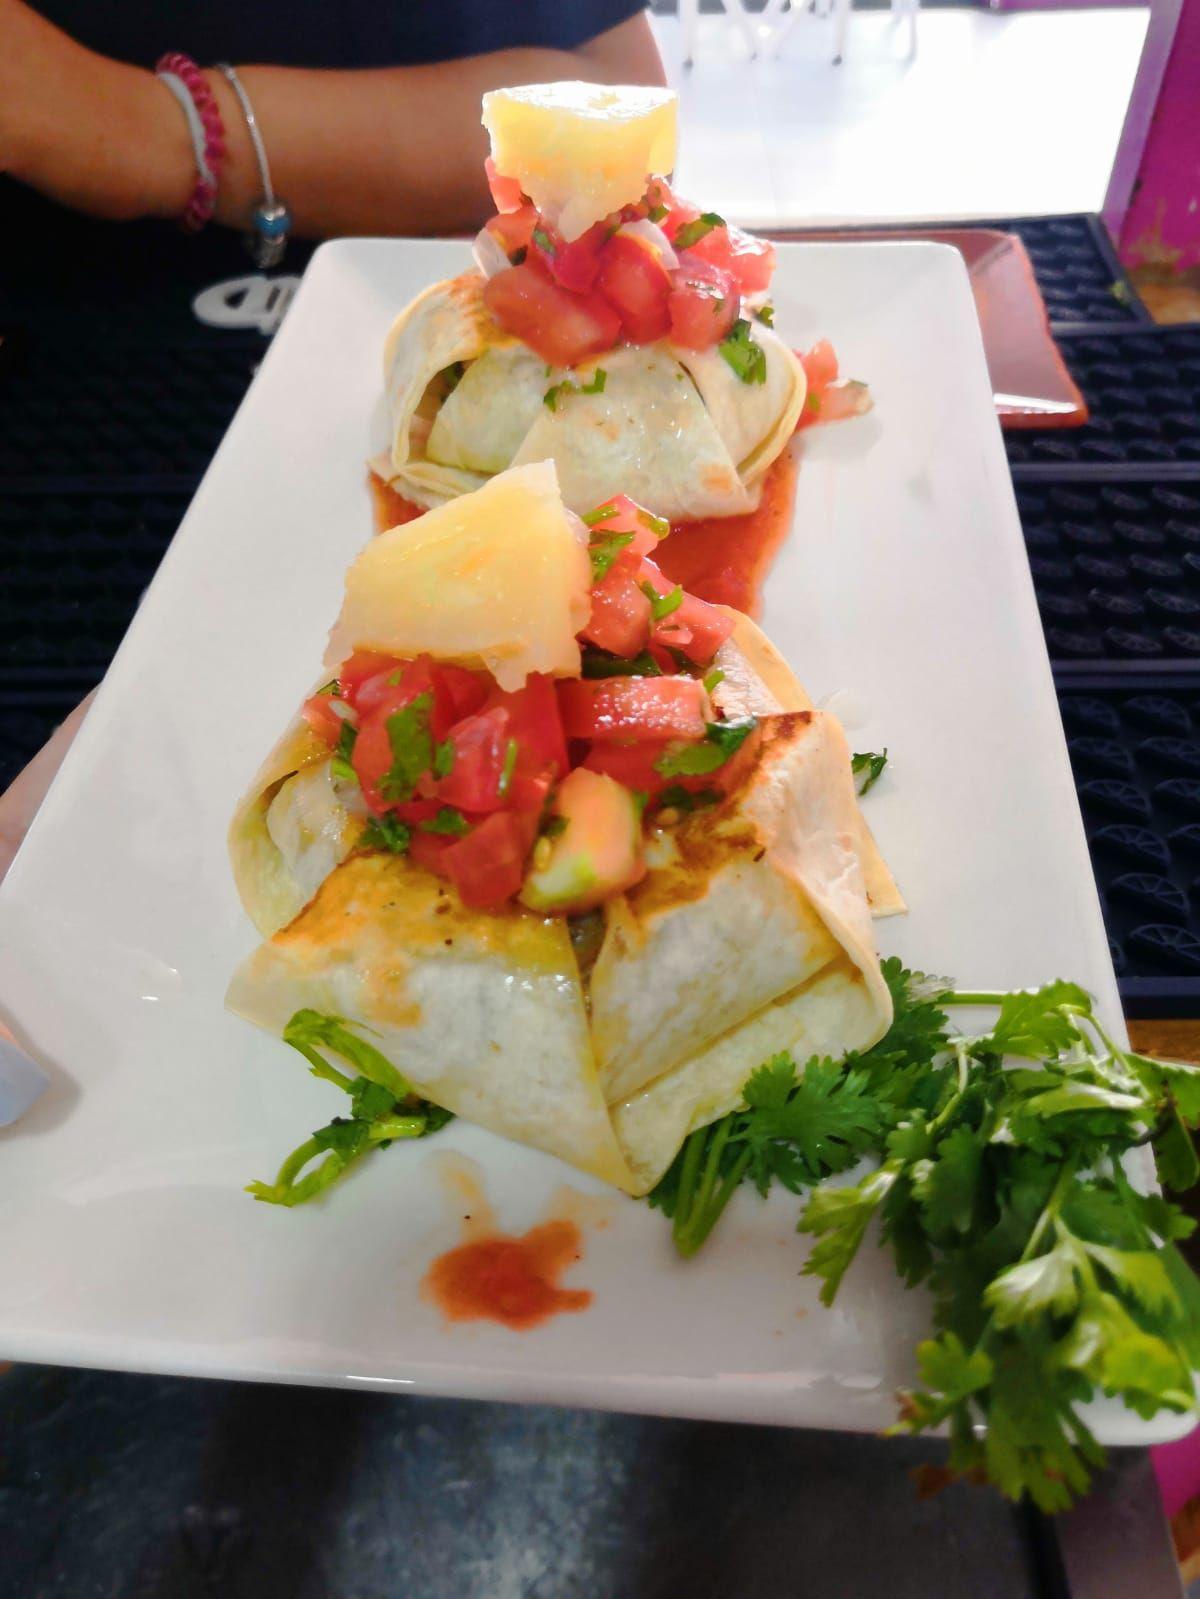 Foto 1 de Restaurante mexicano en  | Cantina La Catrina